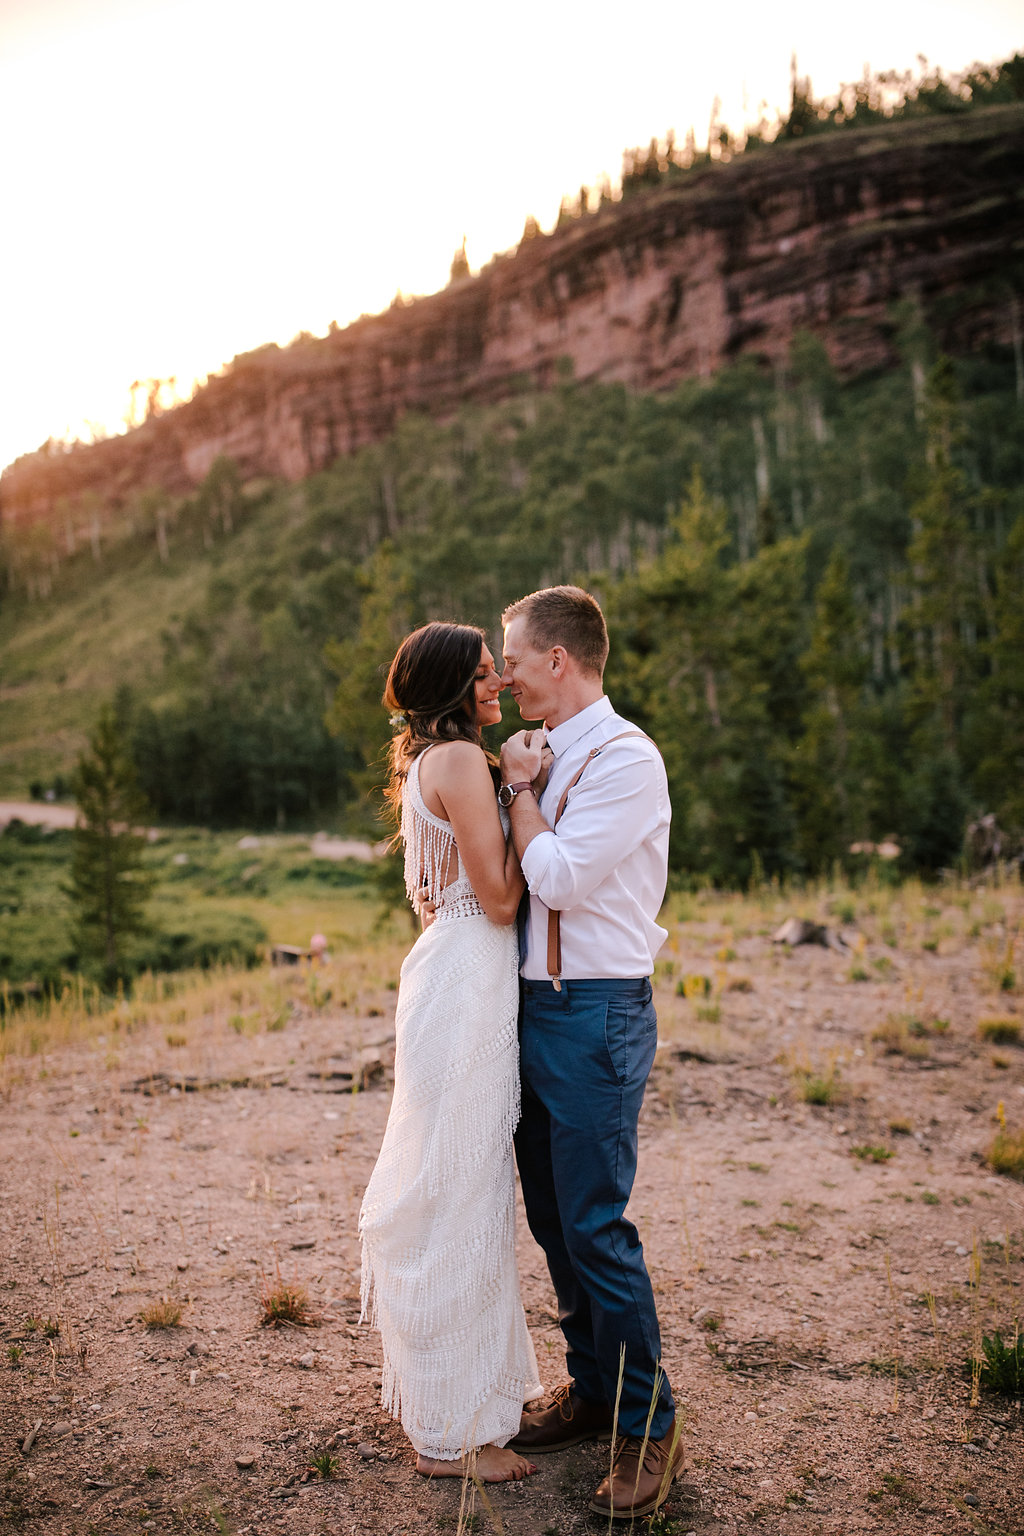 kellylemonphotography_kyle+olivia_weddingsneakpeeks-20.jpg